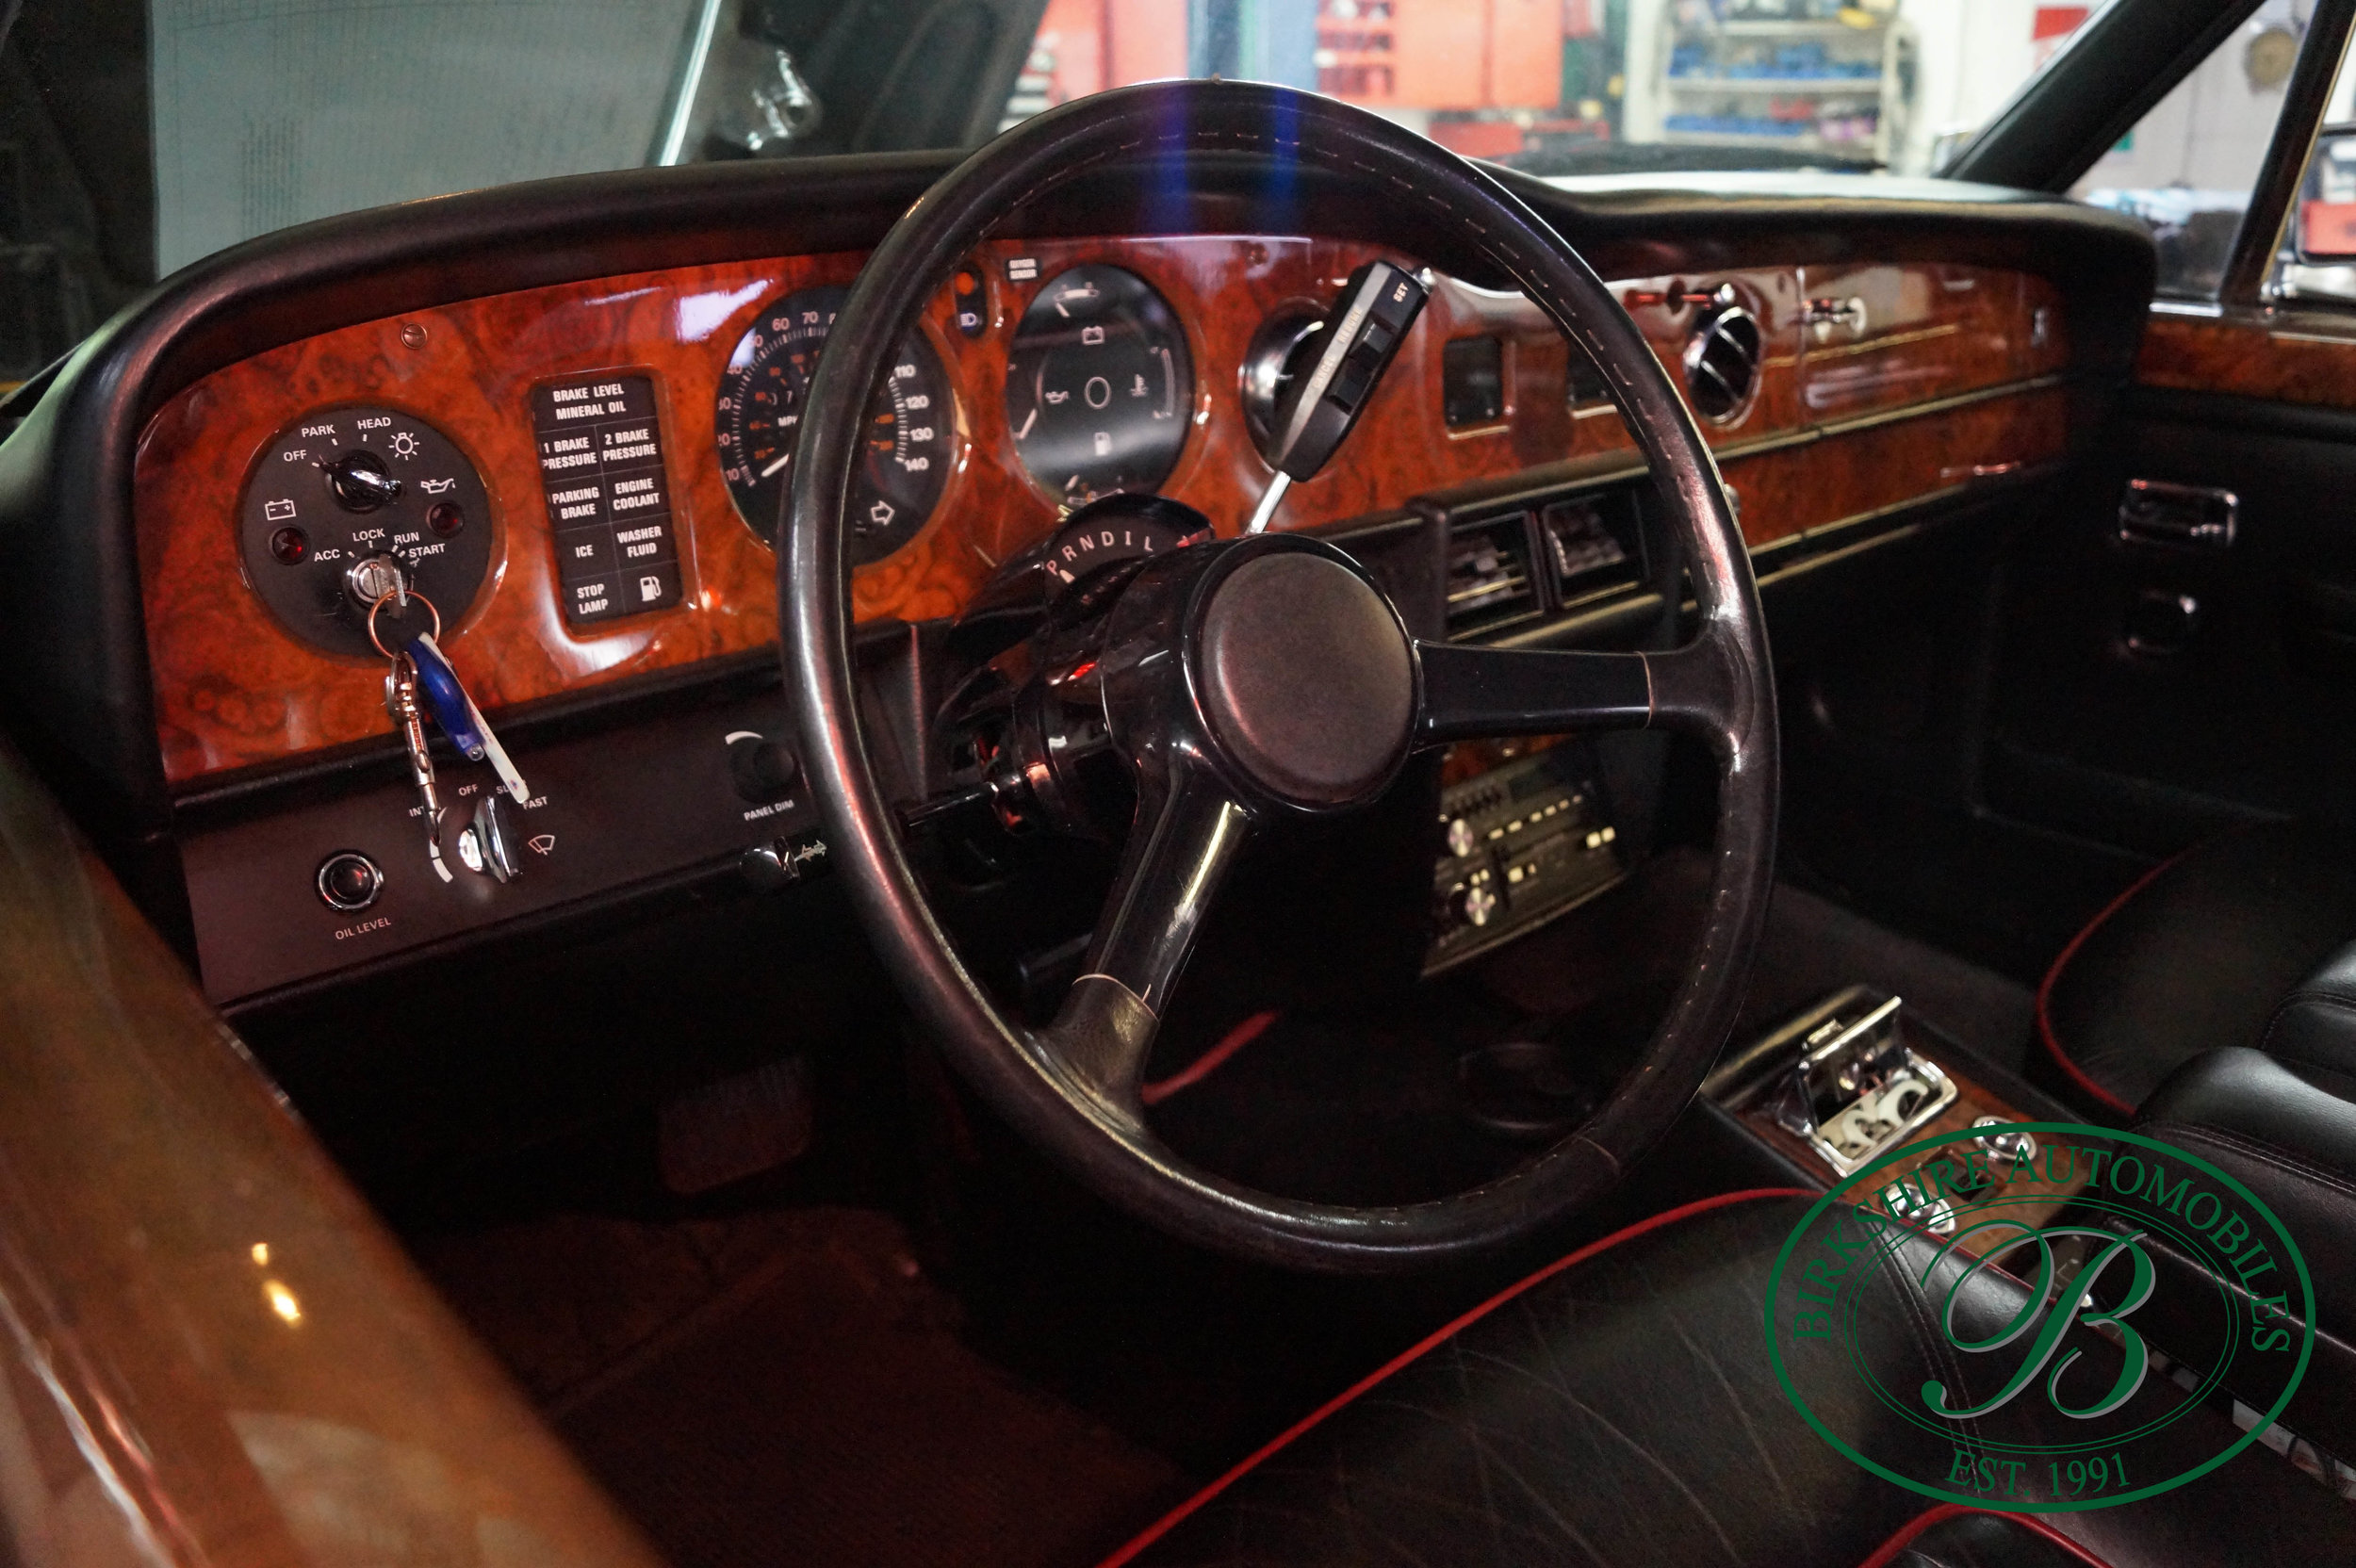 1987 Rolls Royce Silver Spur Birkshire Automobiles (11).jpg